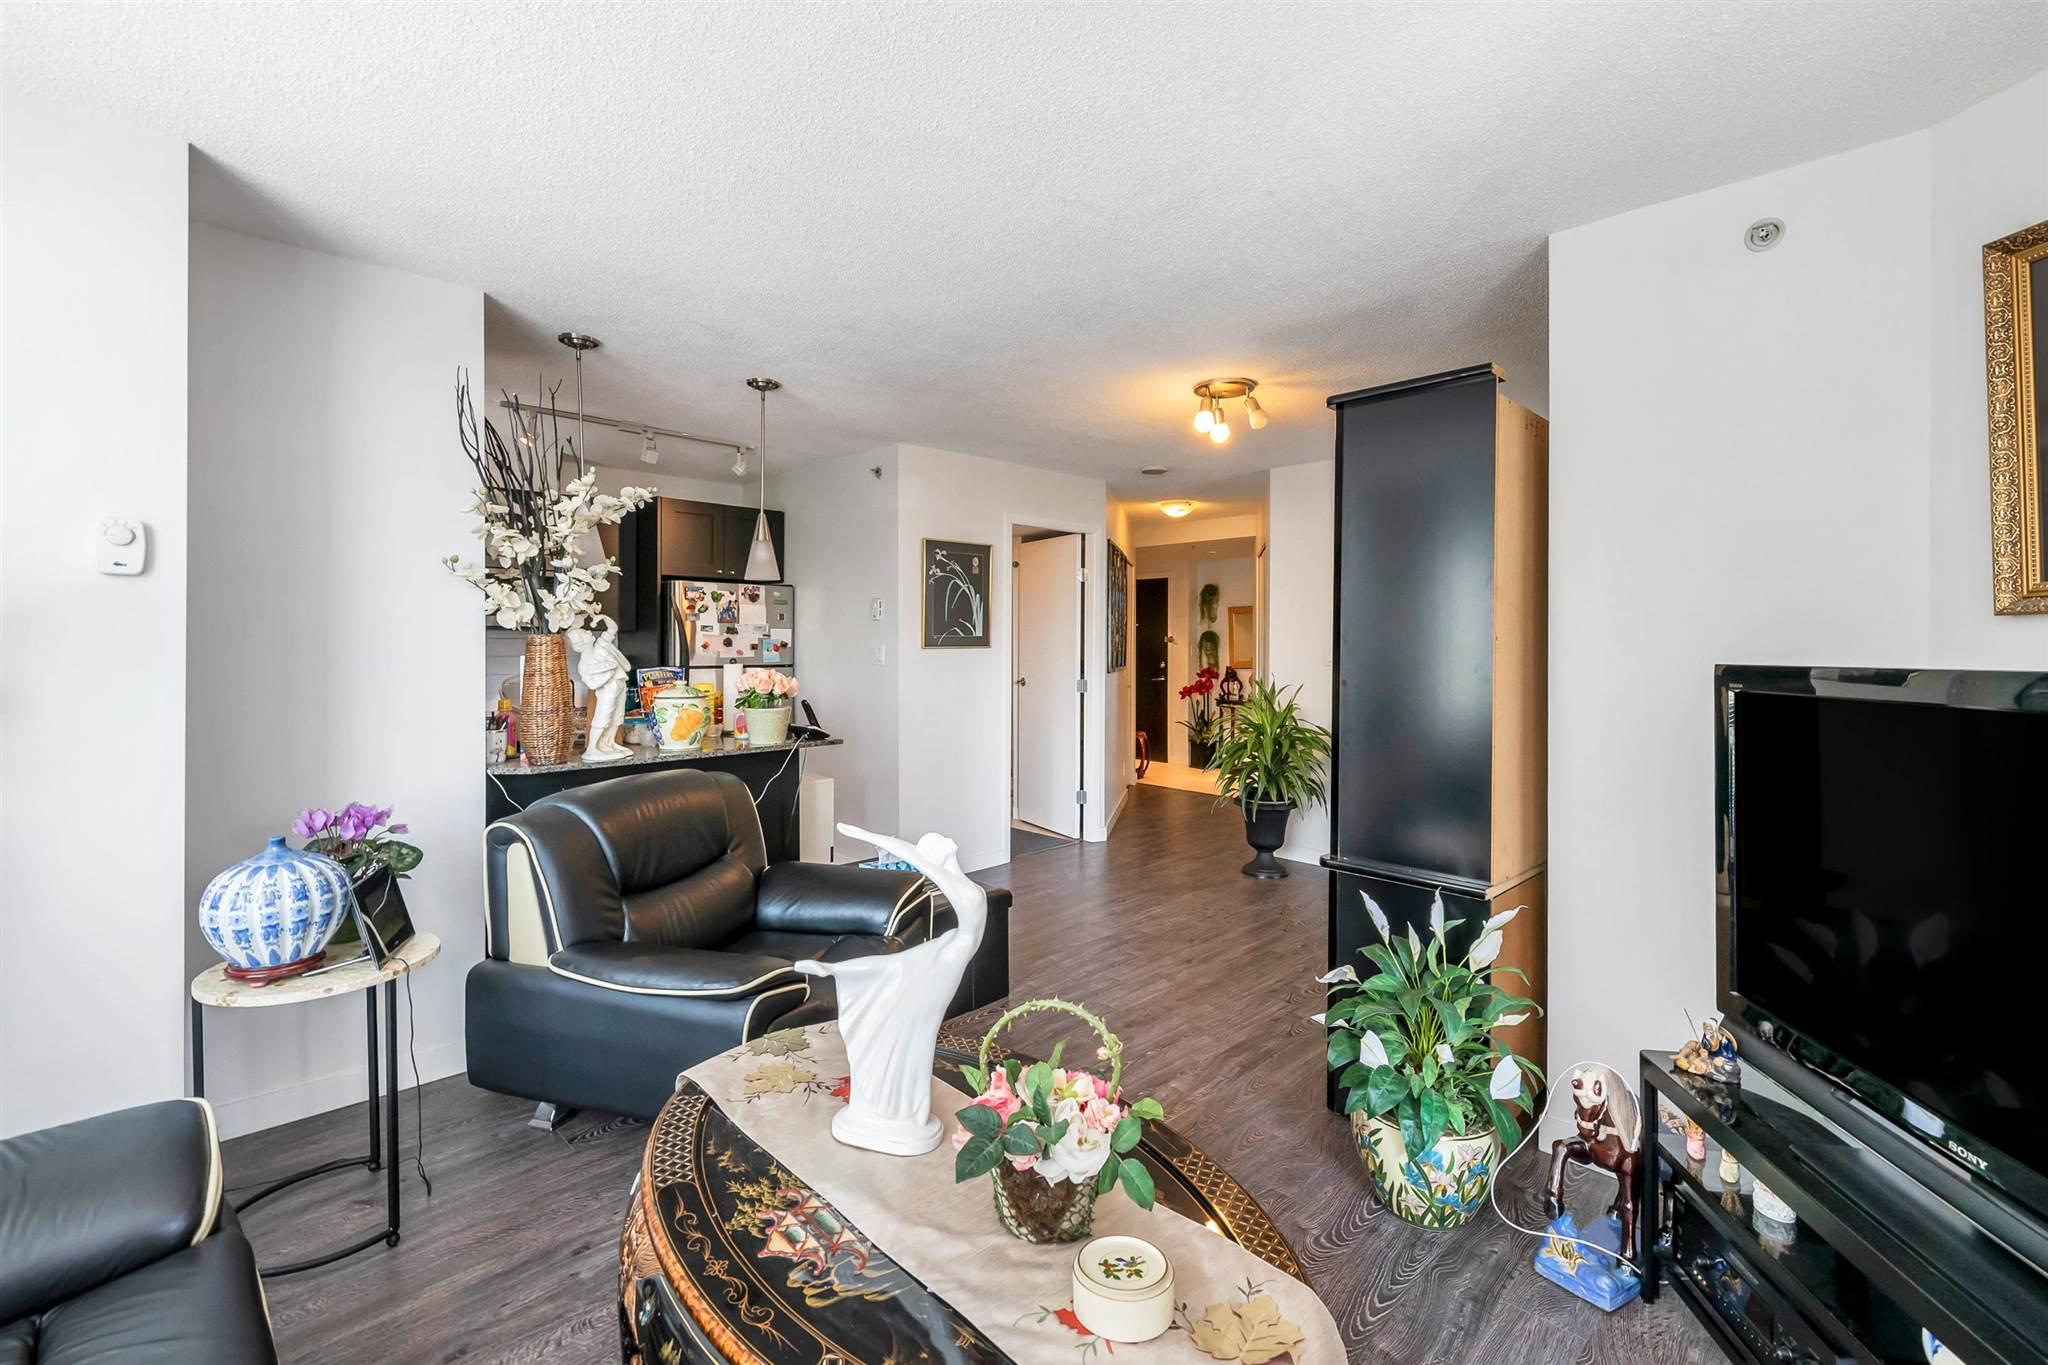 205 7225 ACORN AVENUE - Highgate Apartment/Condo for sale, 2 Bedrooms (R2606454) - #12